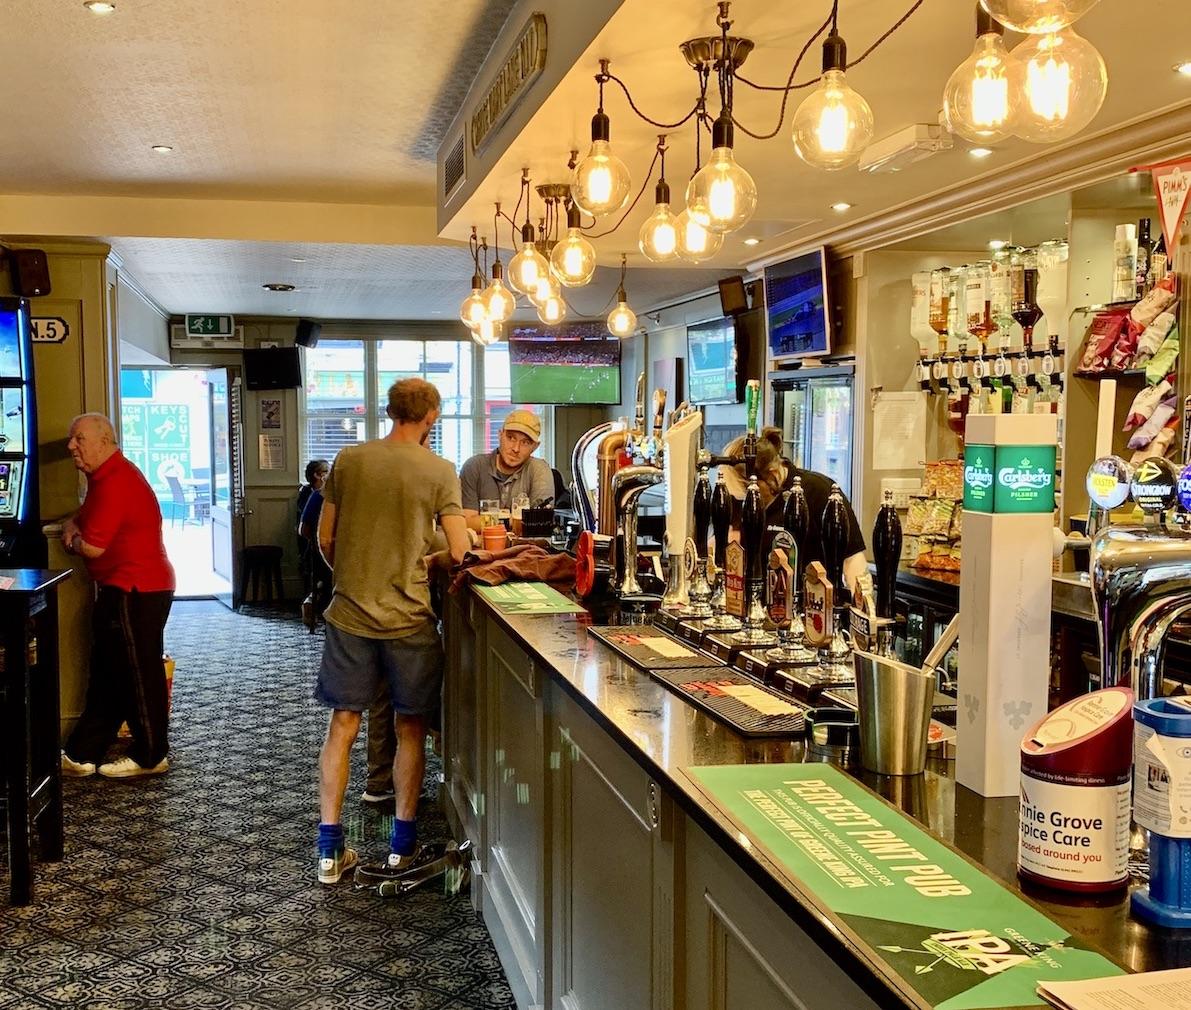 Inside The Generals Arms Pub Chesham.